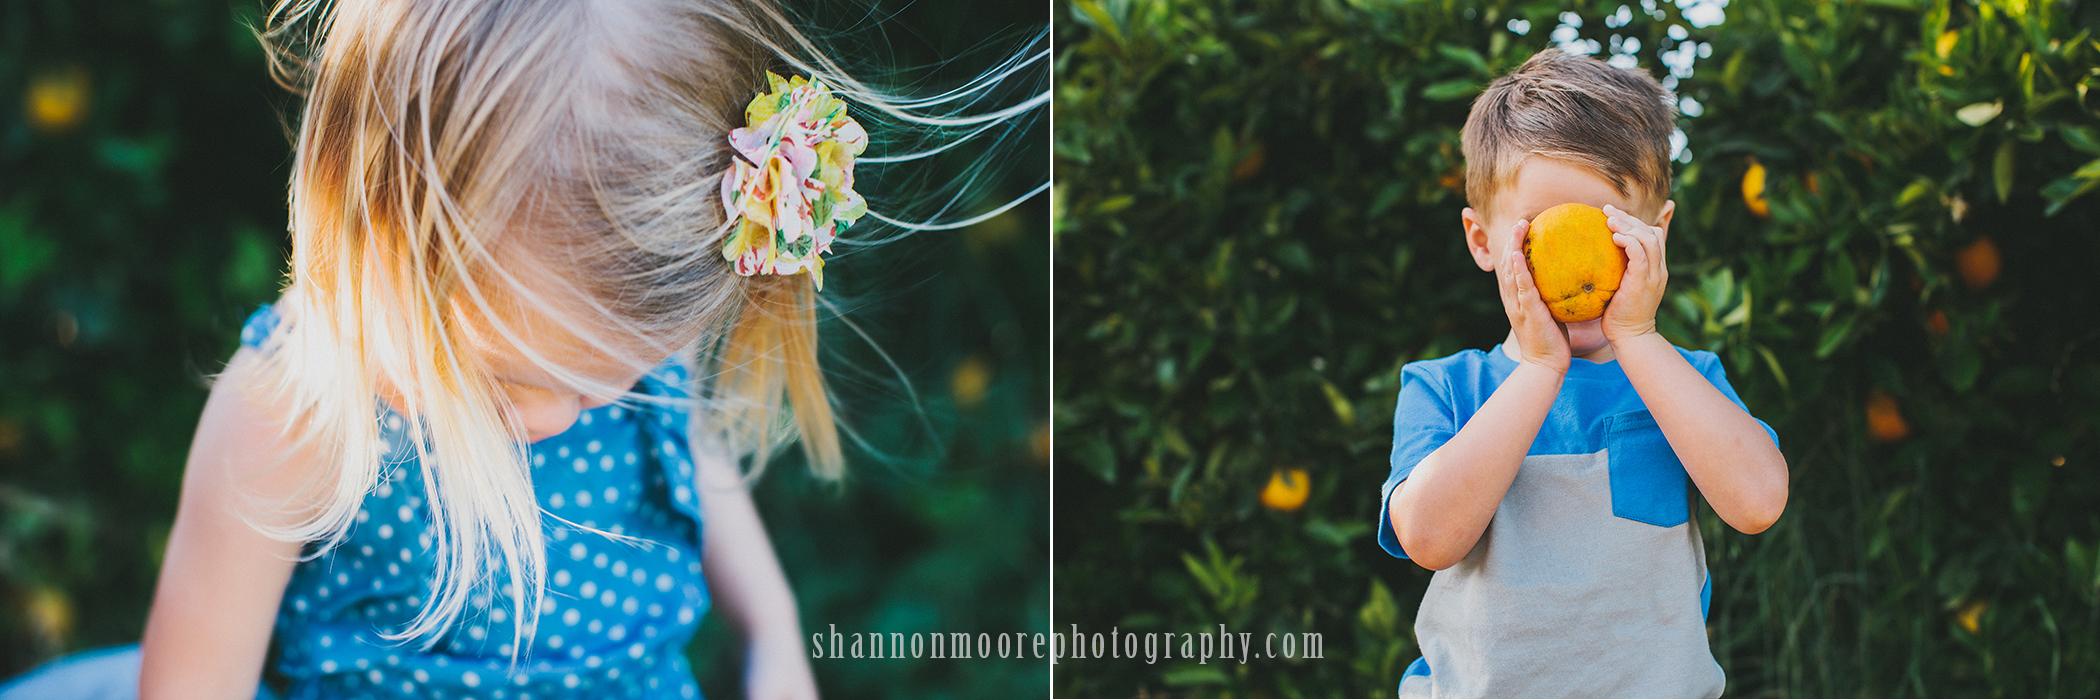 ShannonMoorePhotography-FamilyPhotography-SanLuisObispo-Ca-06